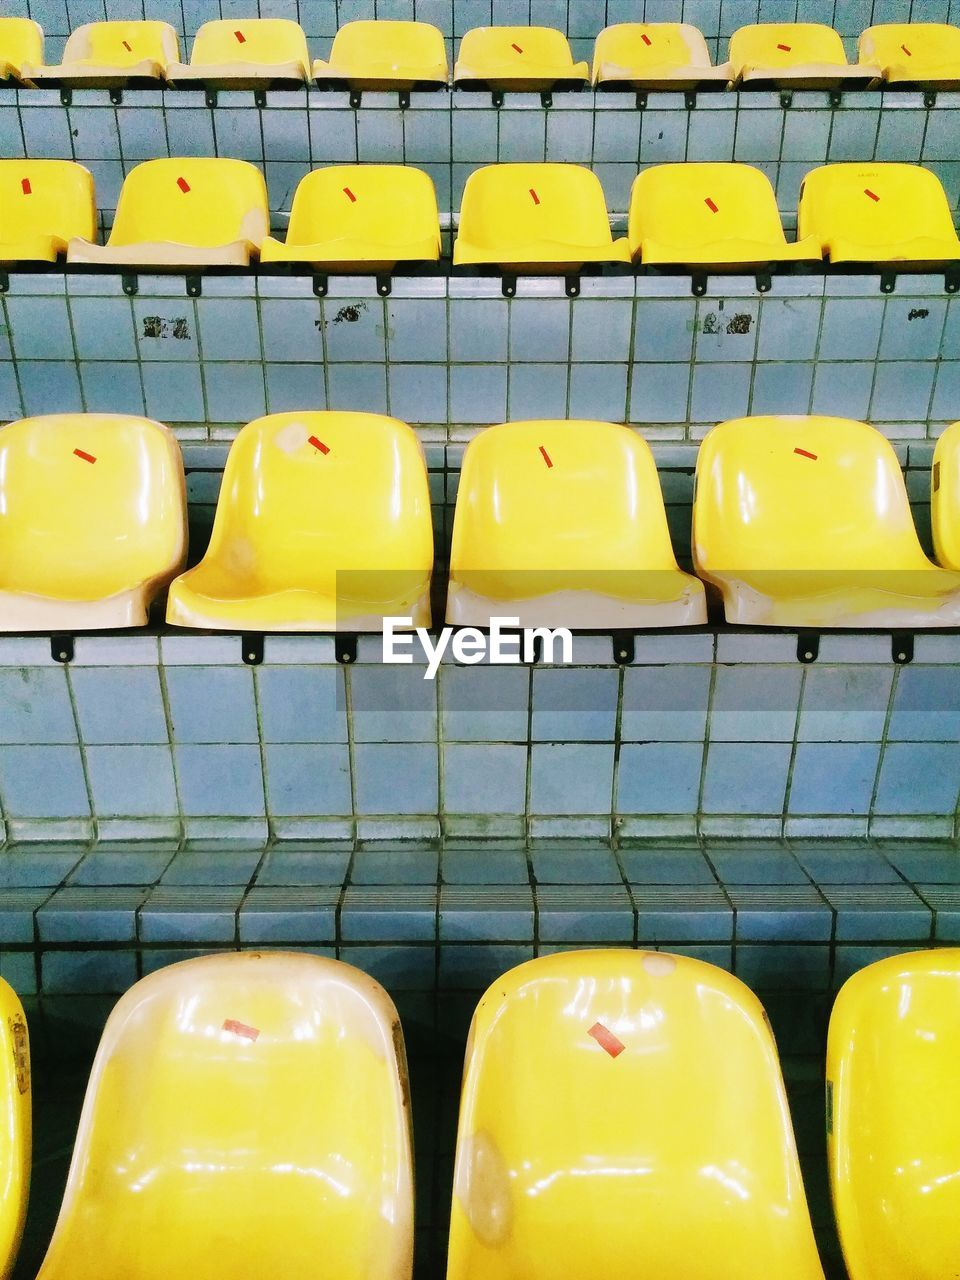 Empty Yellow Bleachers In Stadium